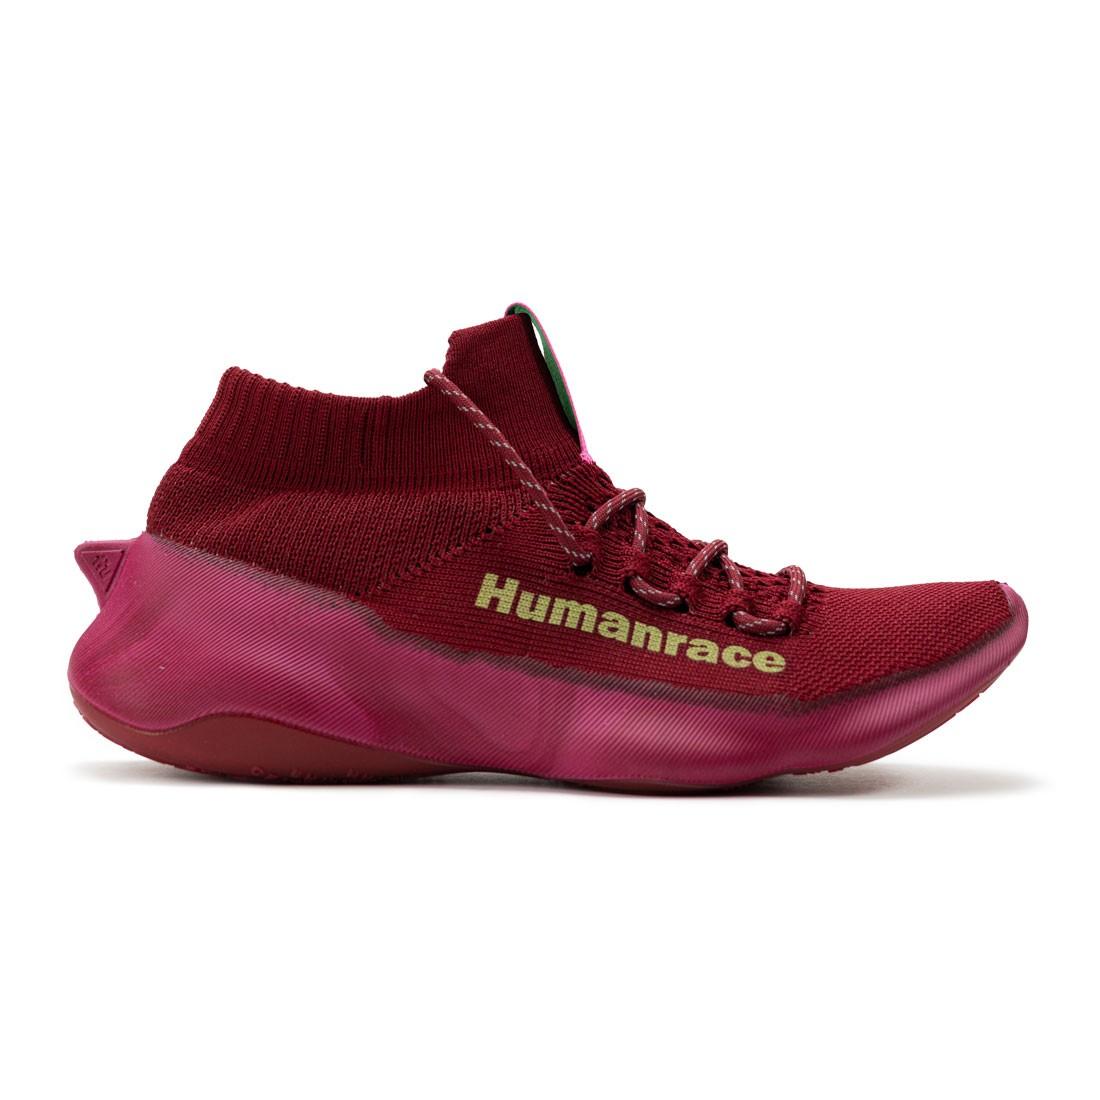 Adidas x Pharrell Williams Men HumanRace Sichona (burgundy / collegiate burgundy / screaming pink / signal green)